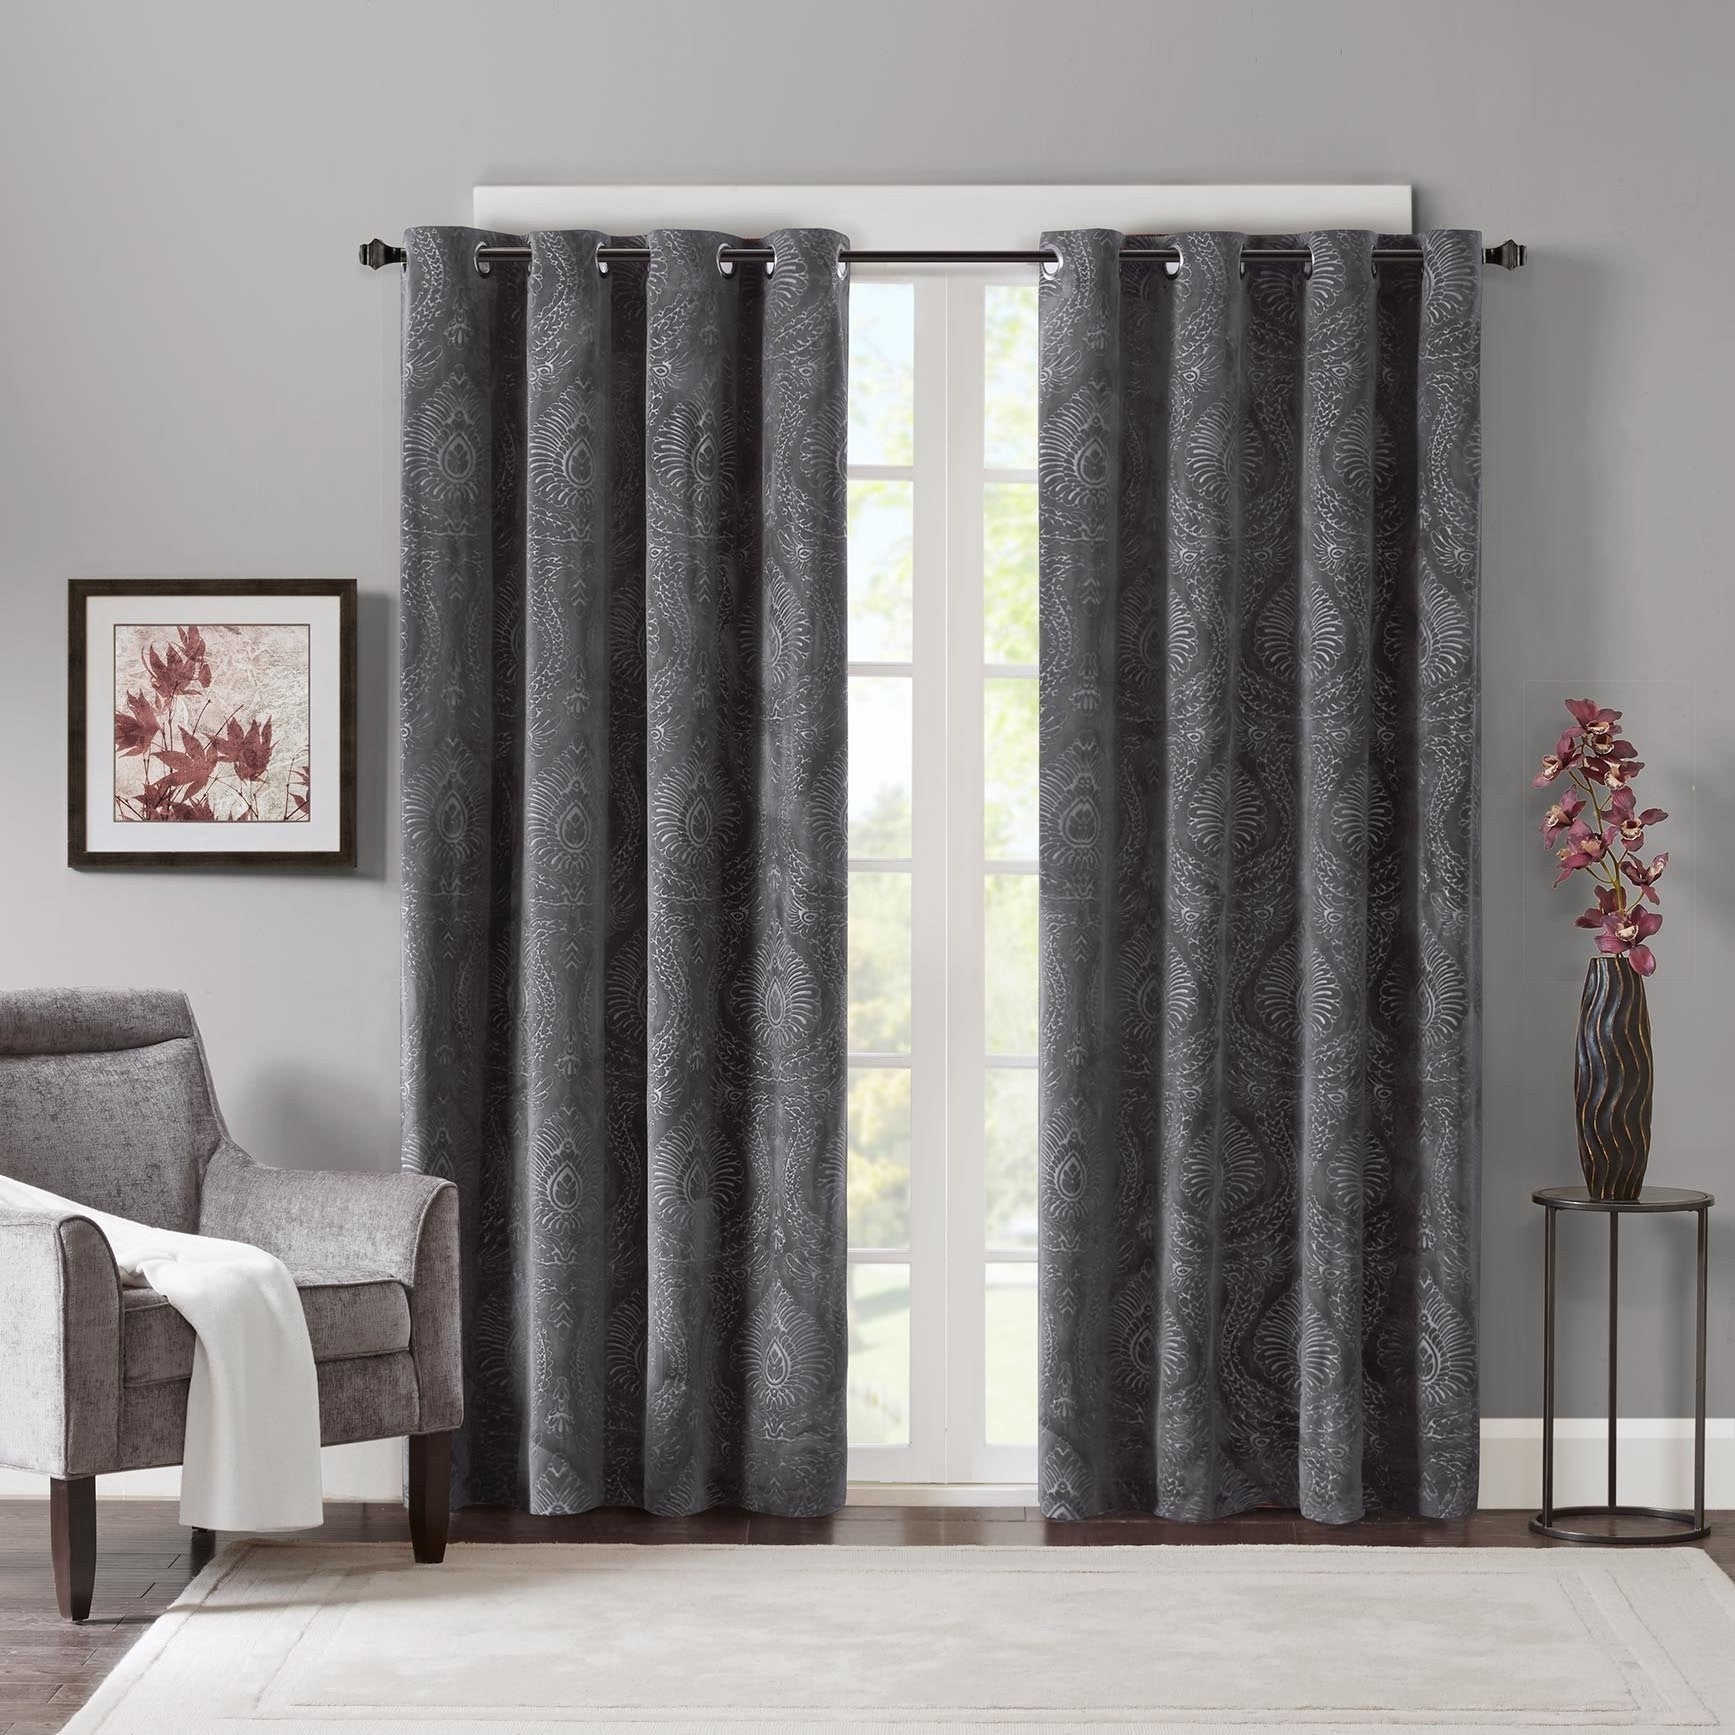 amazon price x curtain home half panels vpch com velvet burgundy signature kitchen drapes dp blackout